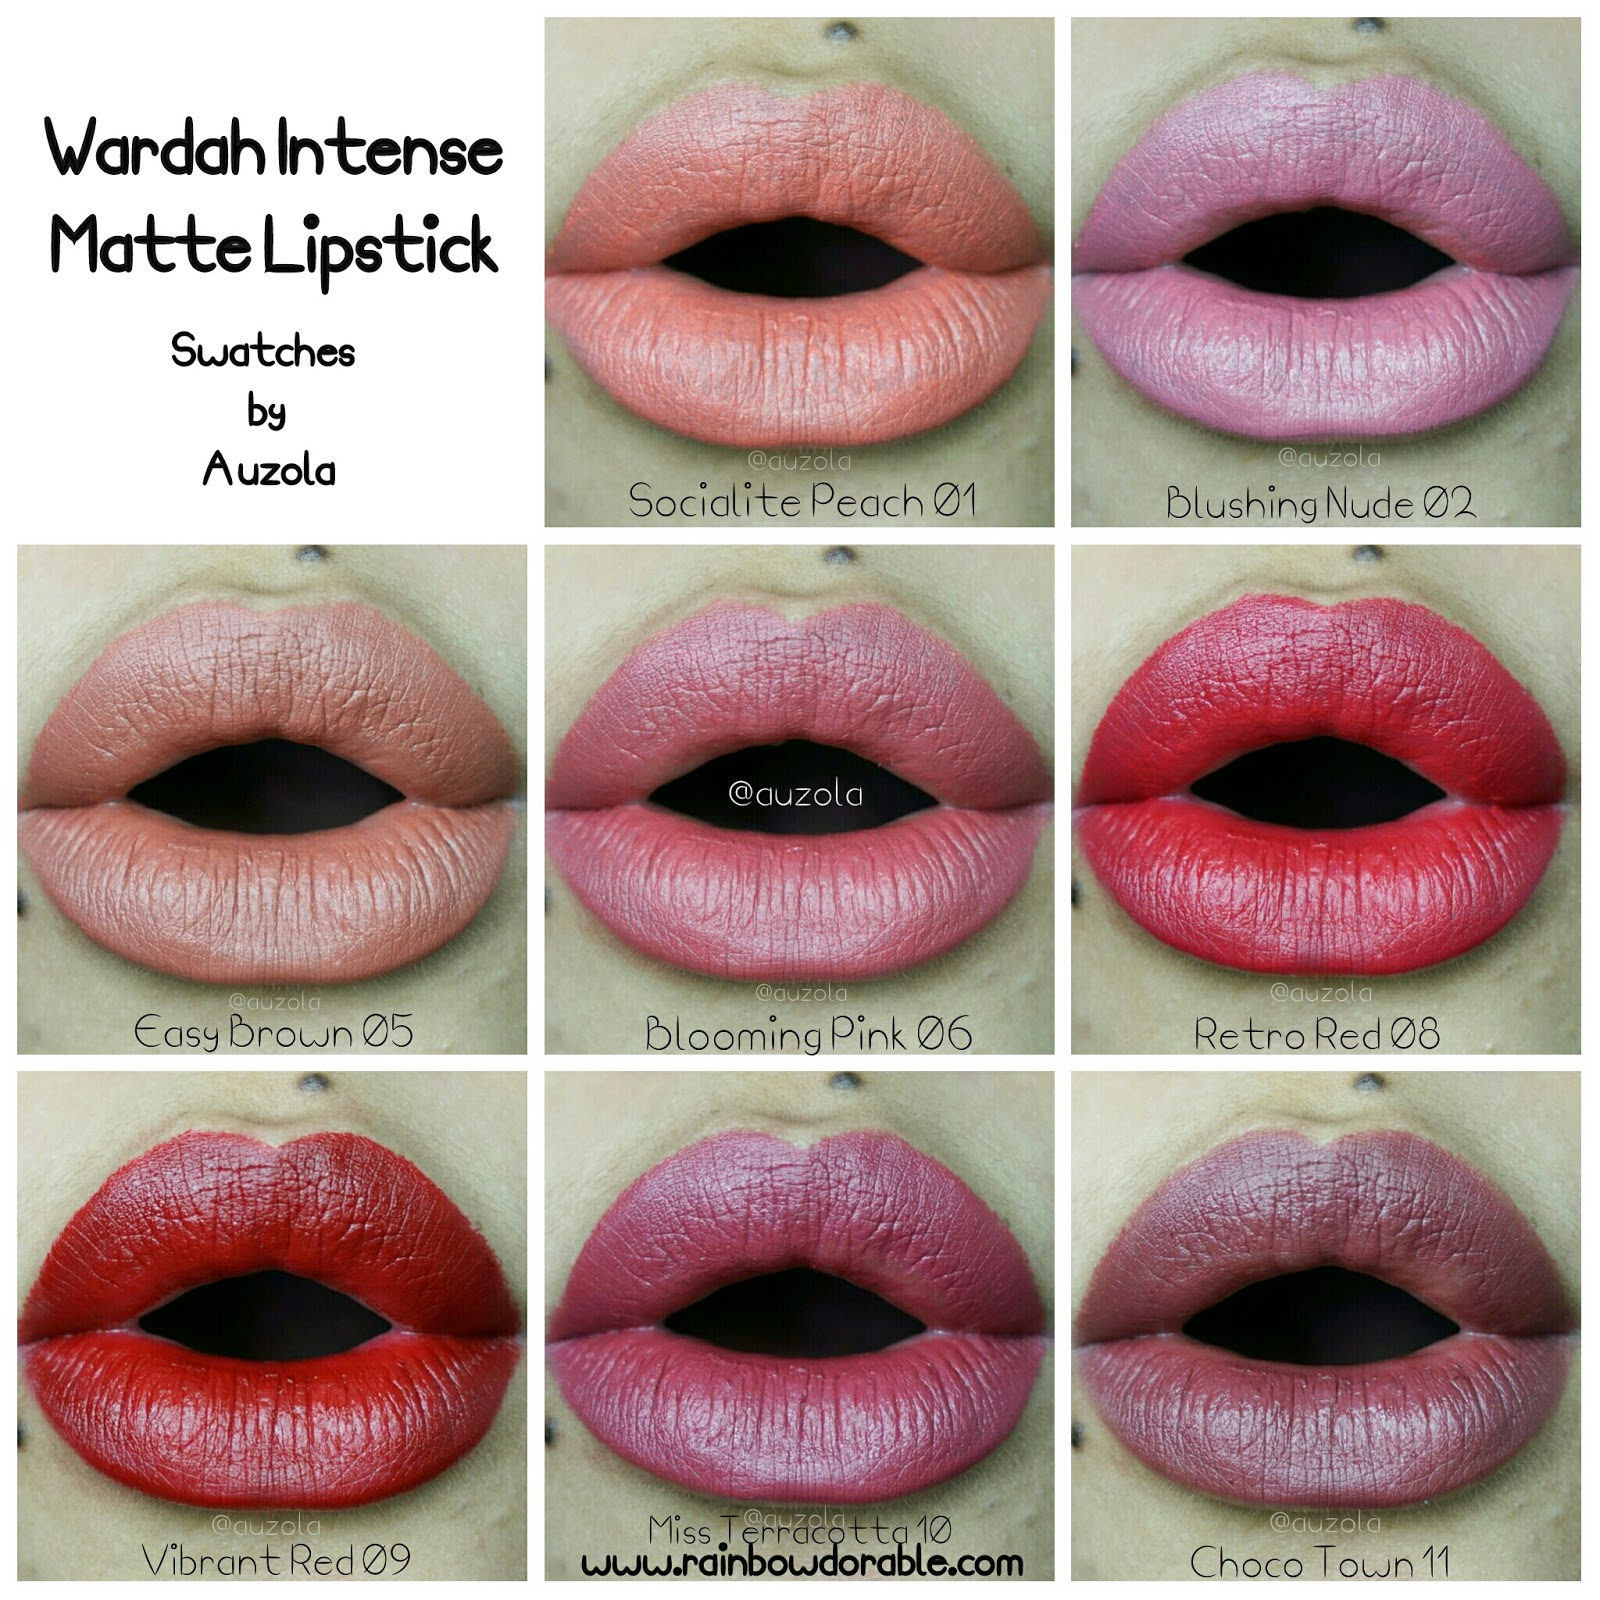 Rainbowdorable By Auzola Indonesian Beauty Blogger Review Wardah